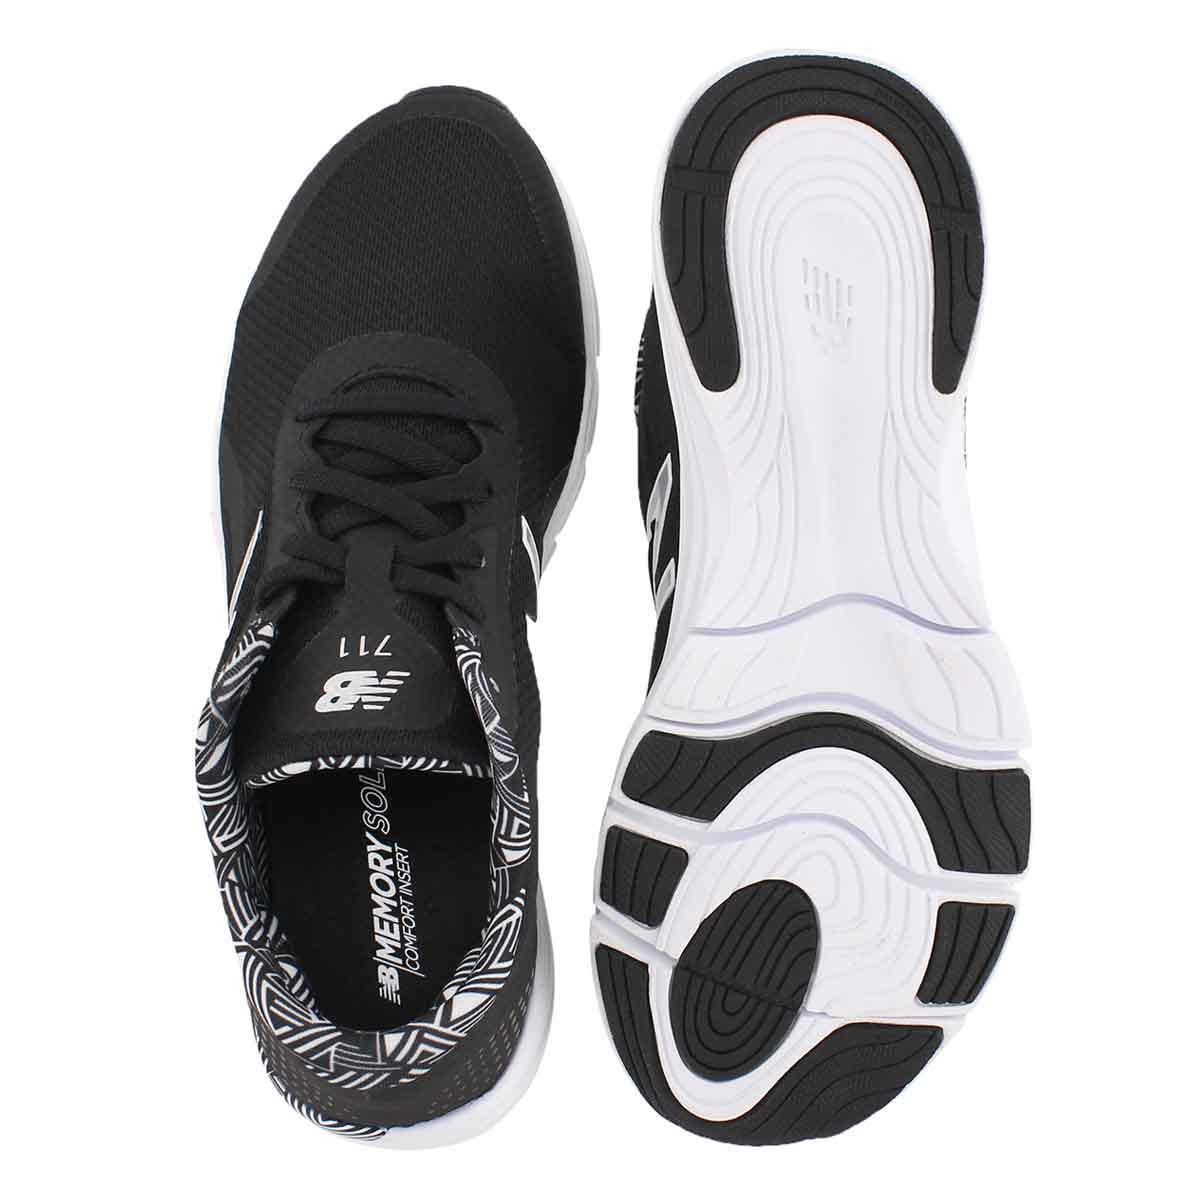 Lds 711v3 black/white lace up sneaker